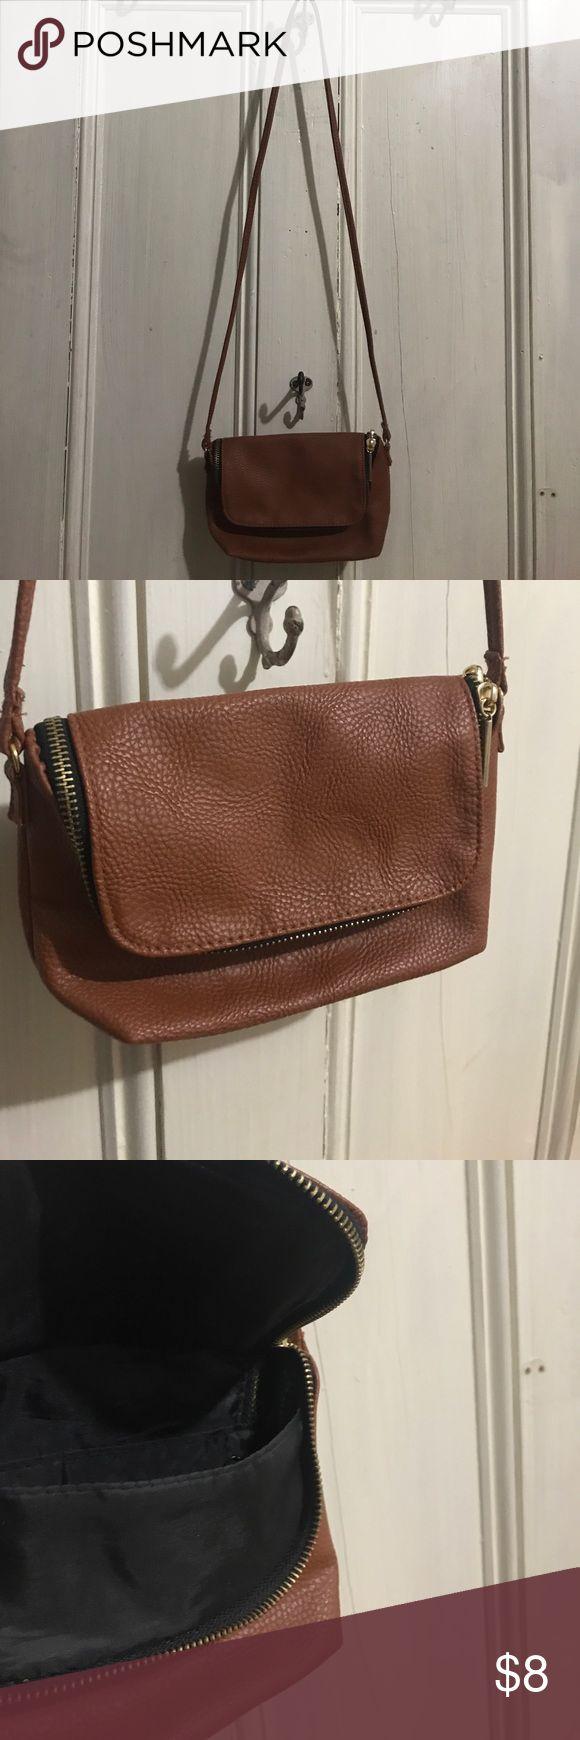 H&M purse H&M purse, camel brown, leather H&M Bags Crossbody Bags